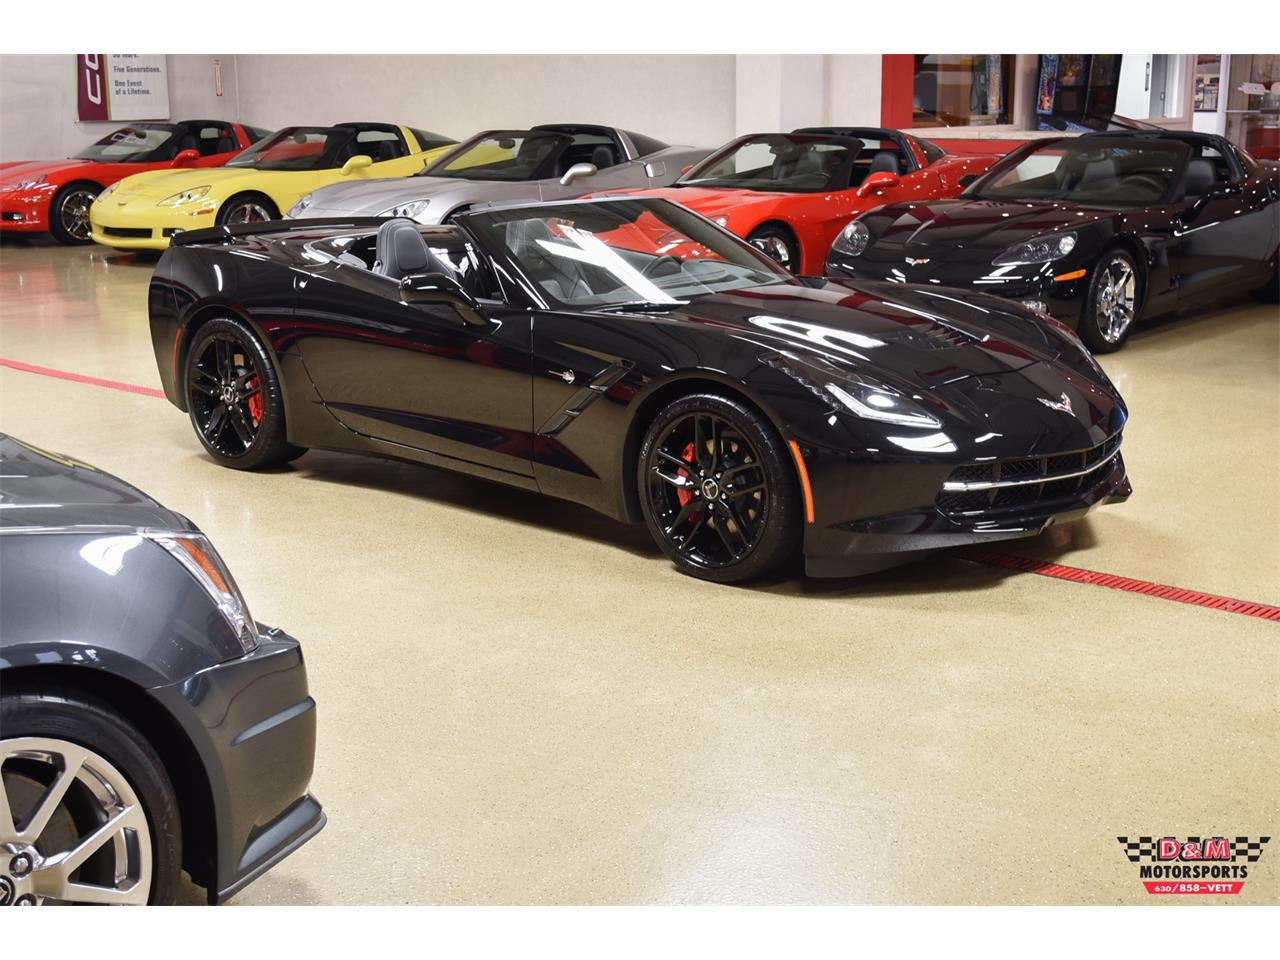 Large Picture of '15 Corvette located in Illinois - $50,995.00 - PZ21